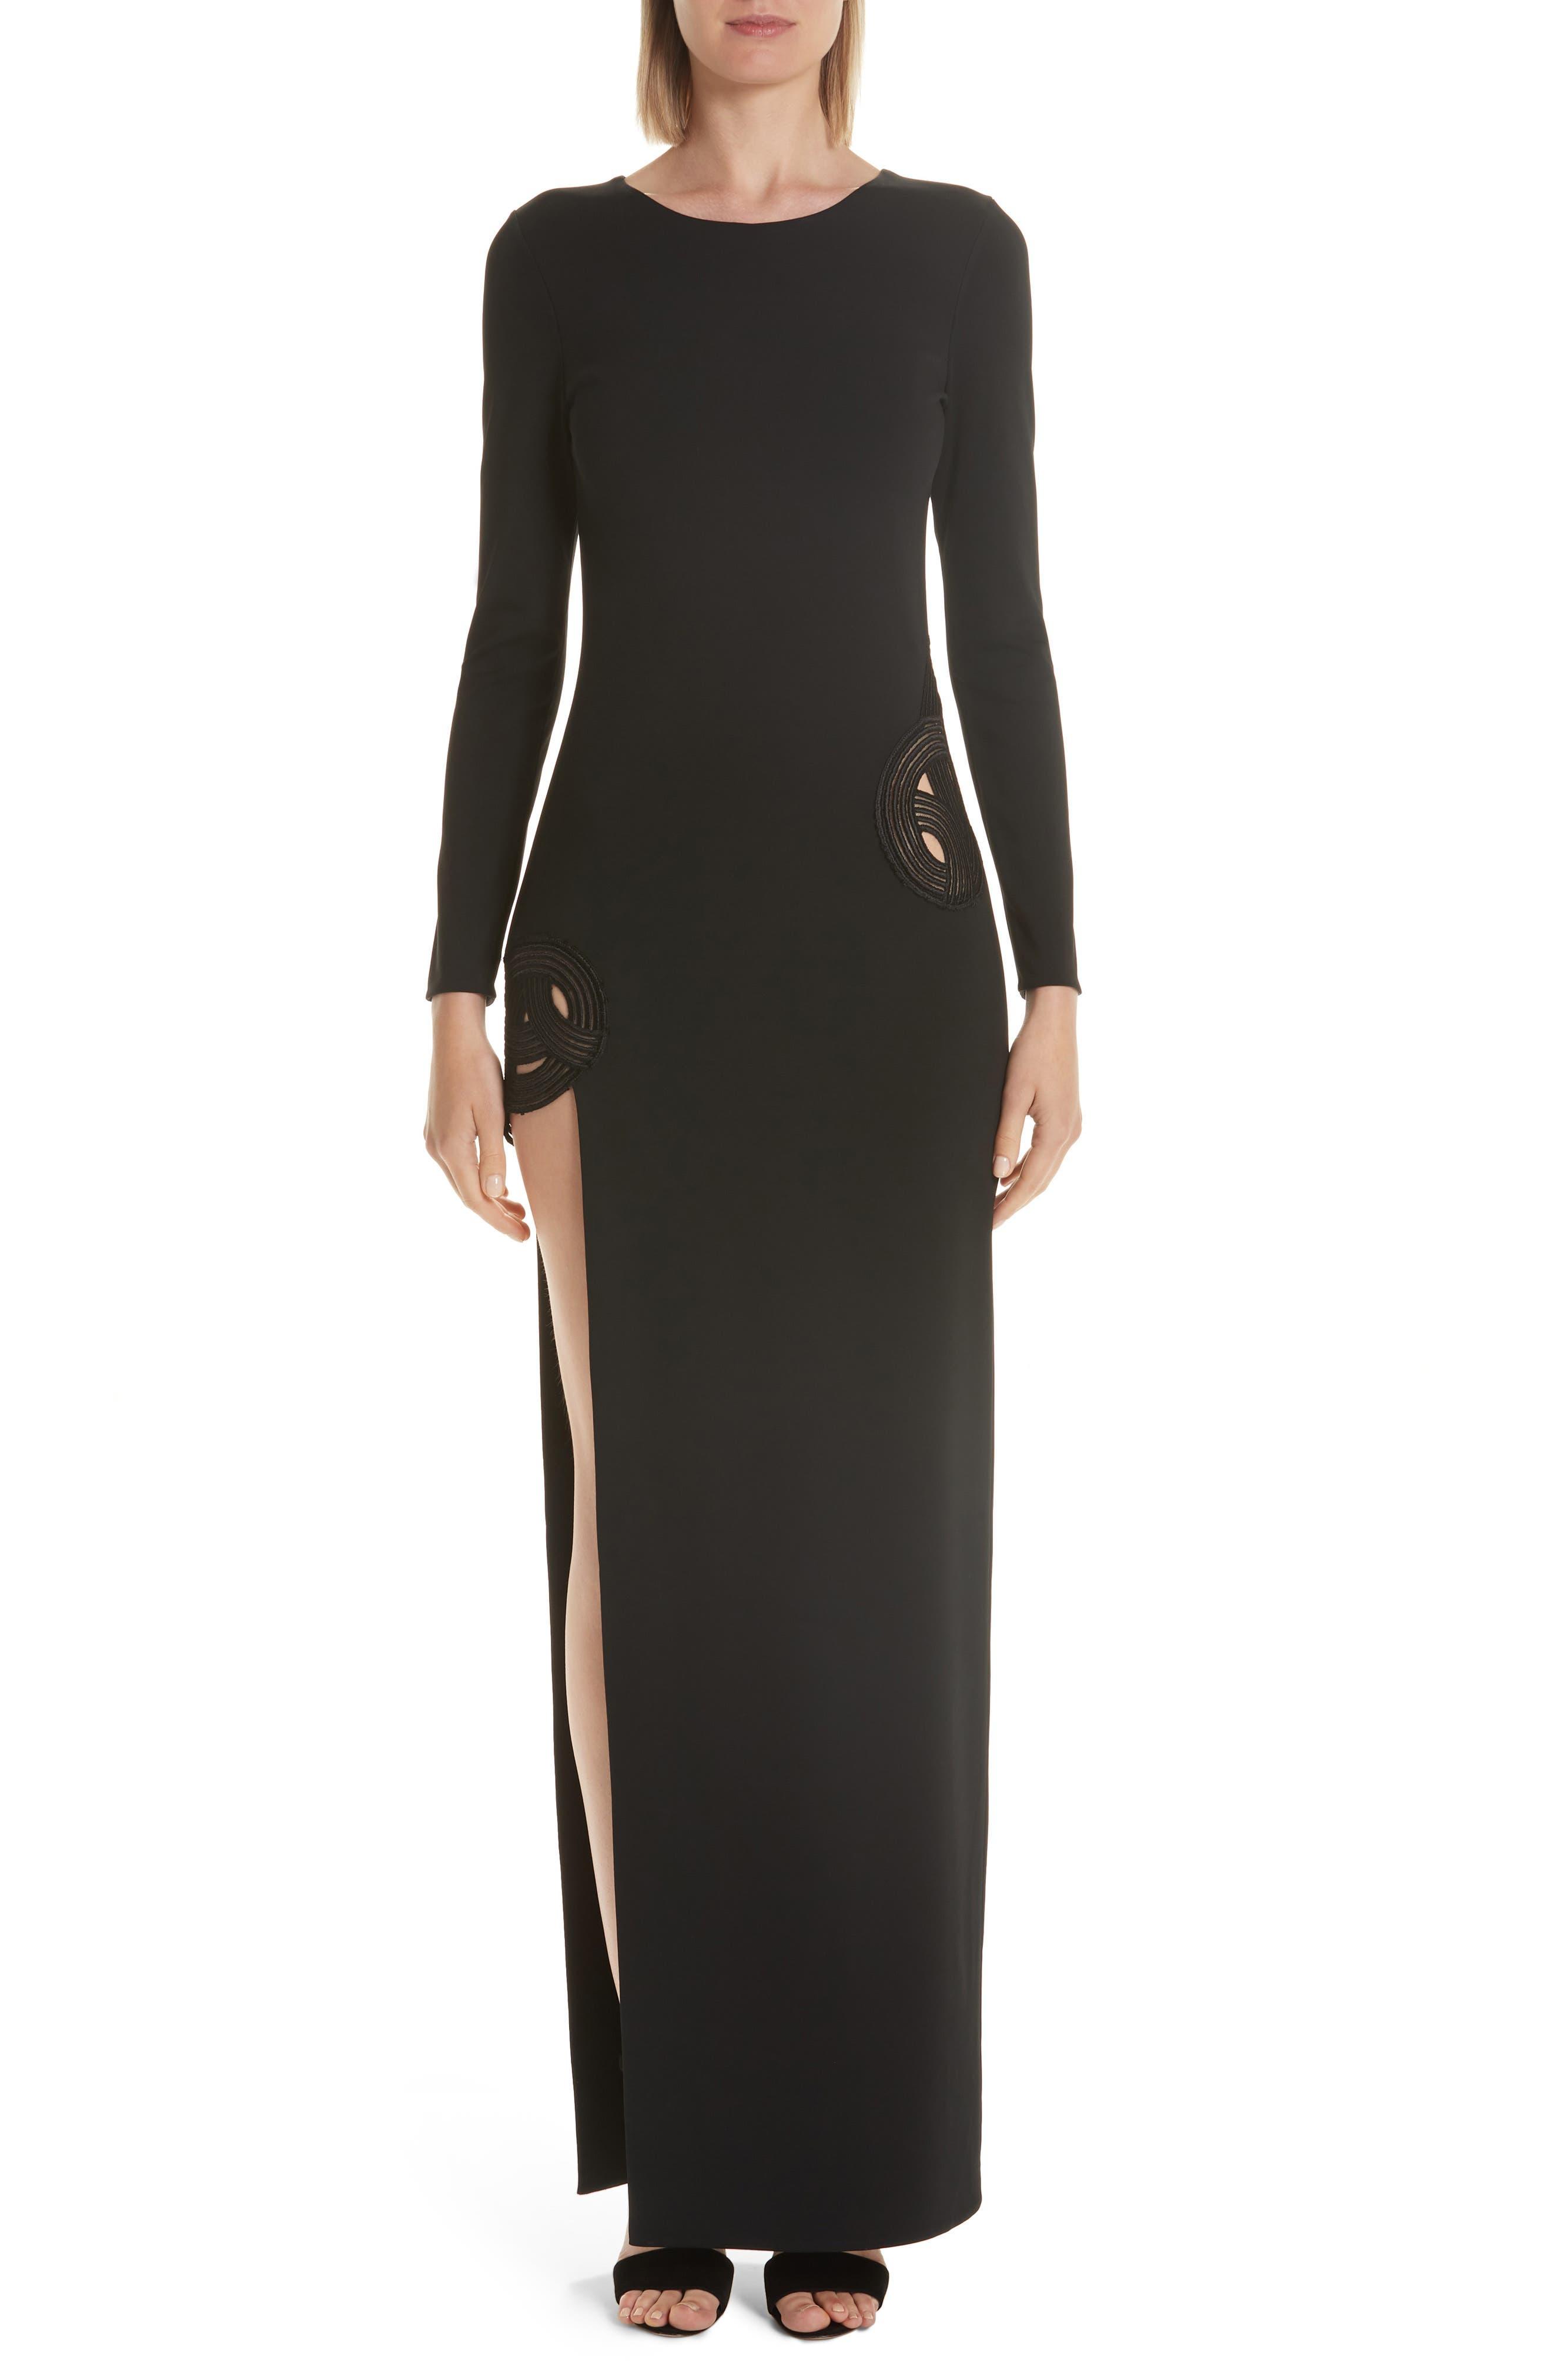 Haney Gia Long Sleeve Evening Dress, Black